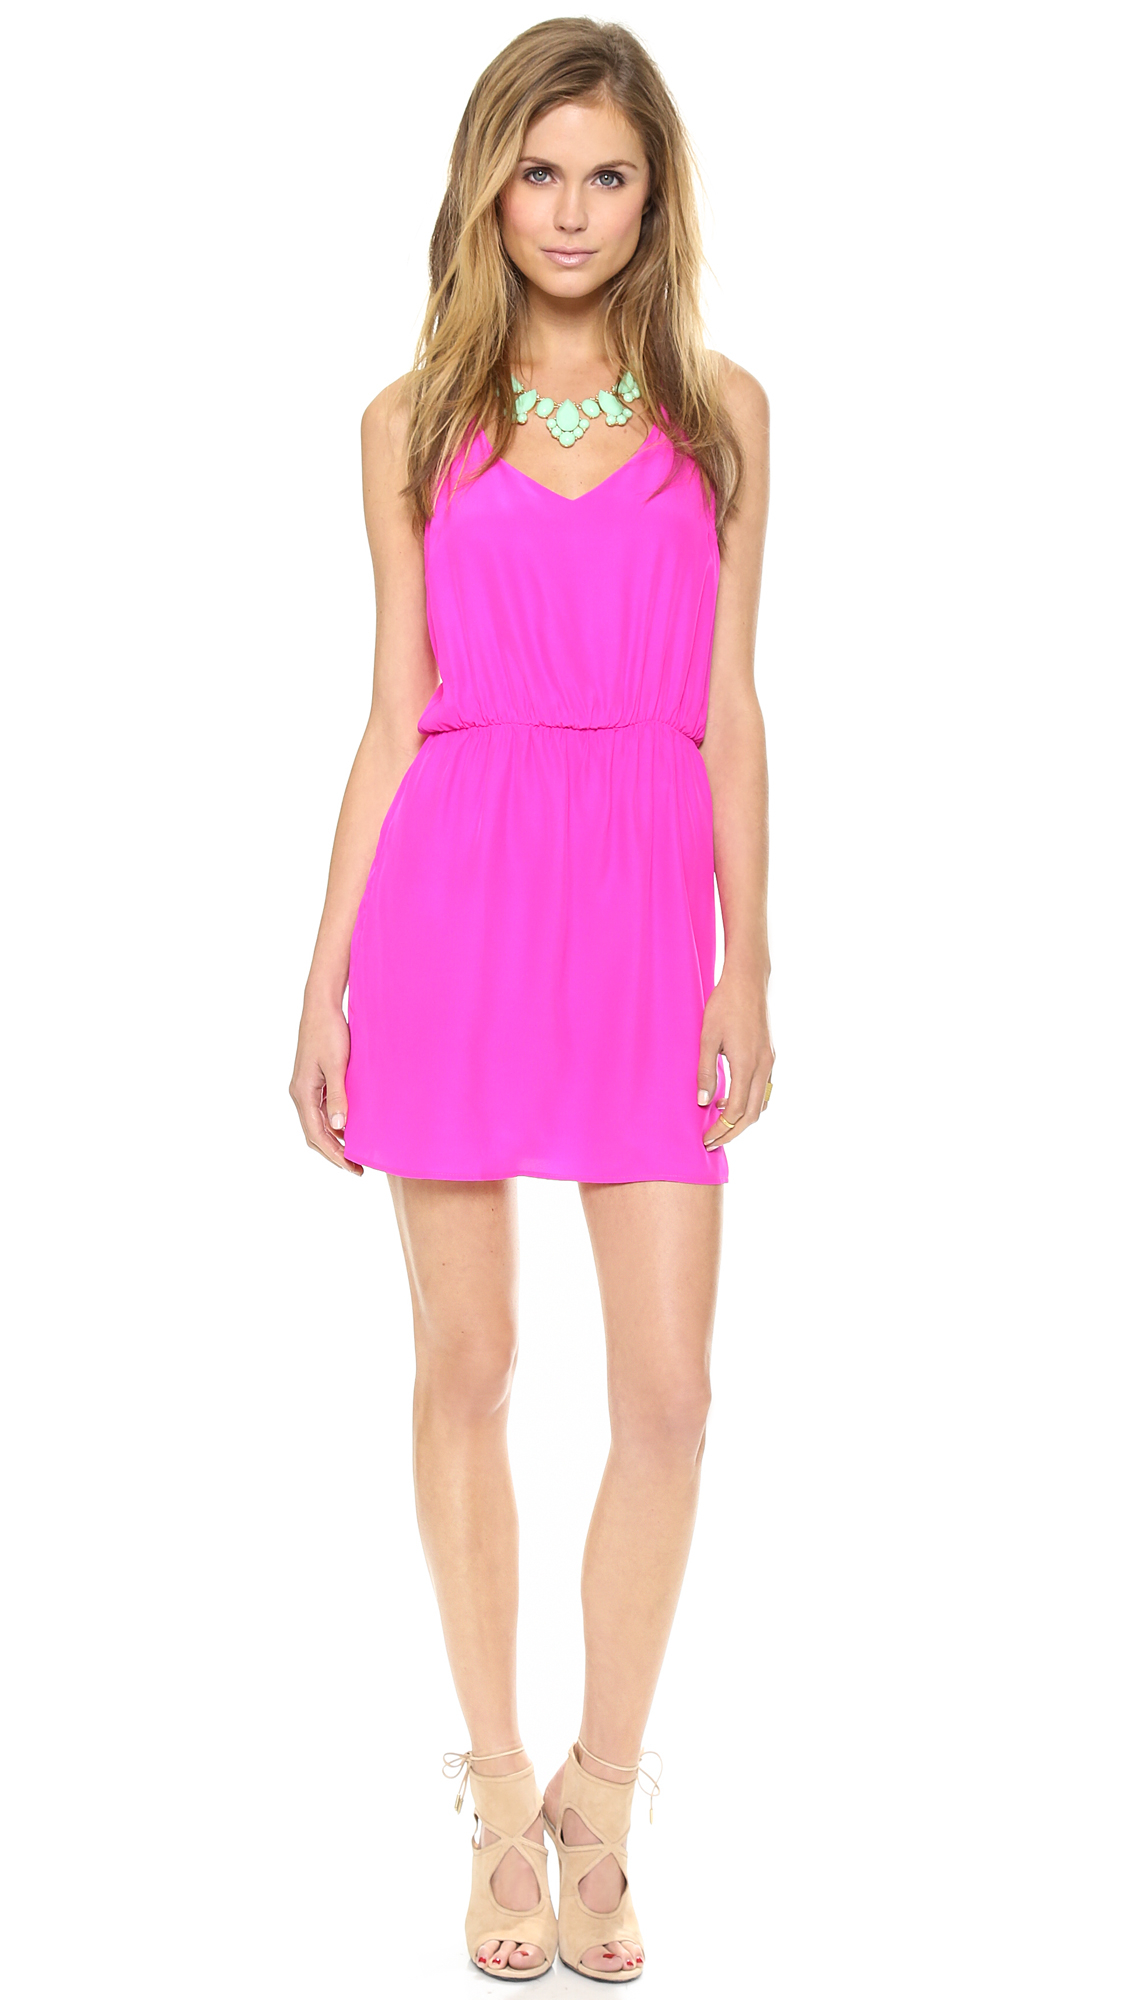 Amanda uprichard Multi Strap Dress in Pink (Hot Pink) | Lyst